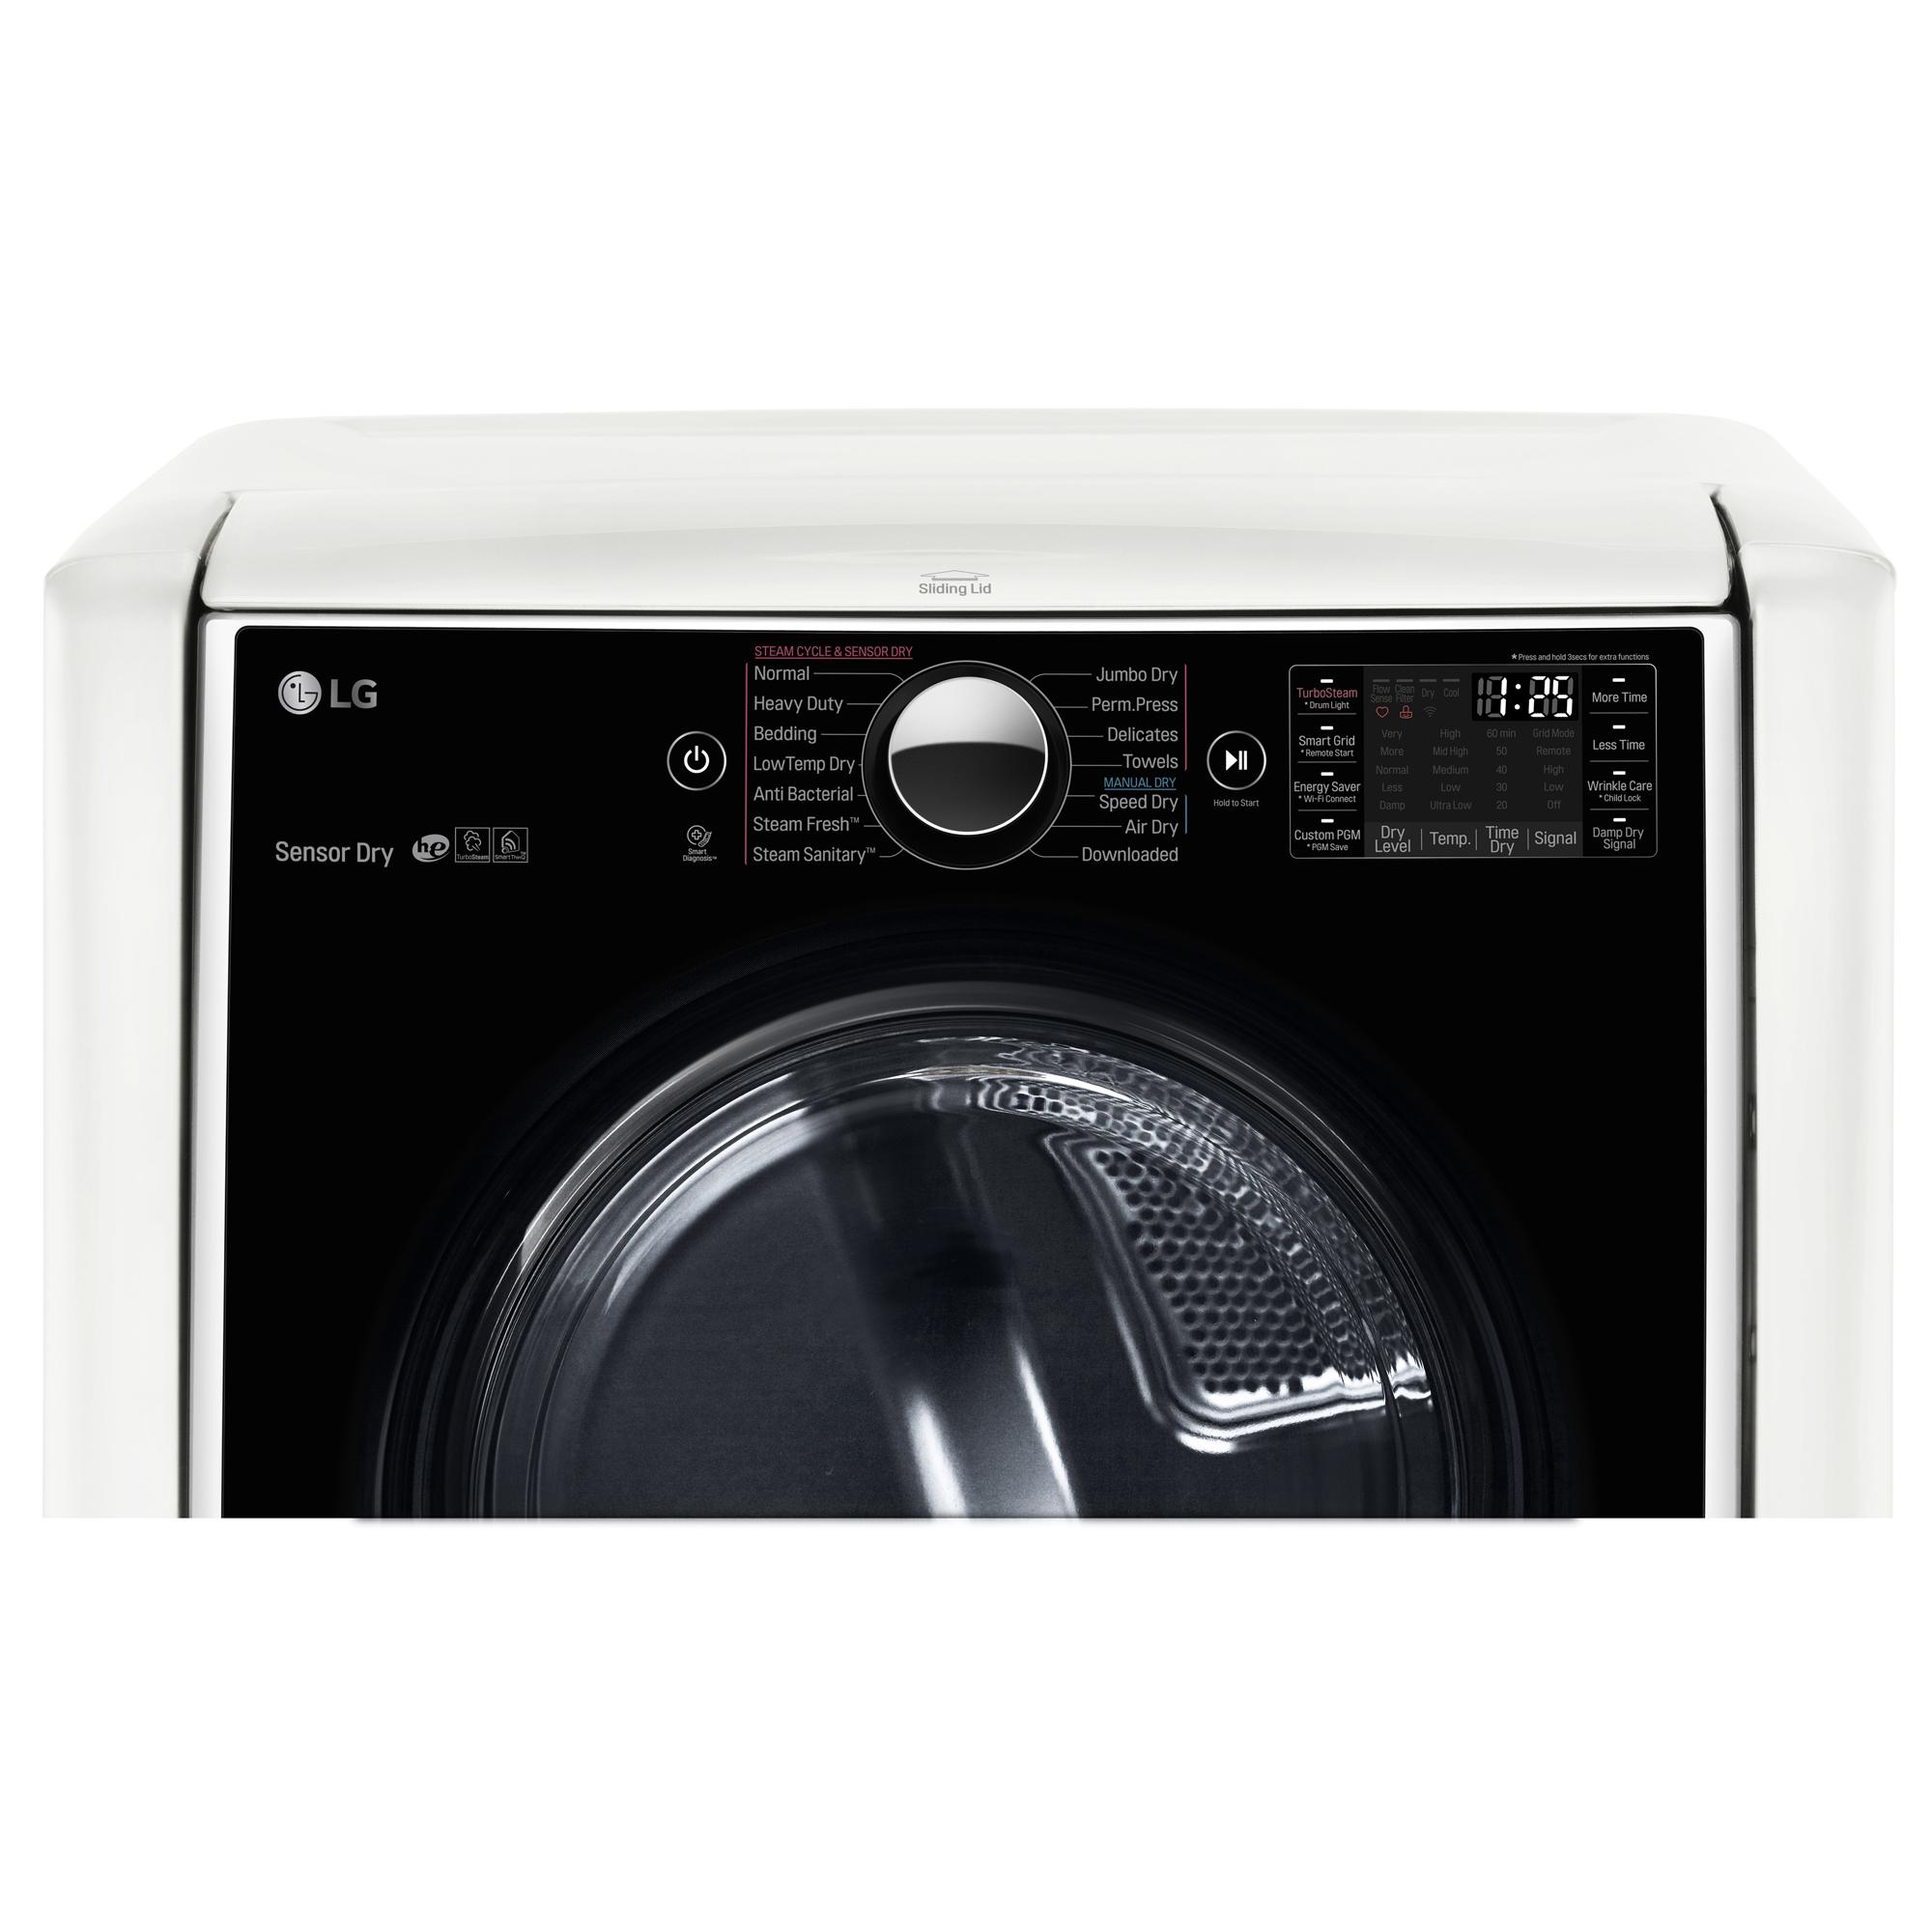 LG DLGX9001W 9.0 cu. ft. Mega Capacity Gas Dryer w/ TurboSteam™ – White